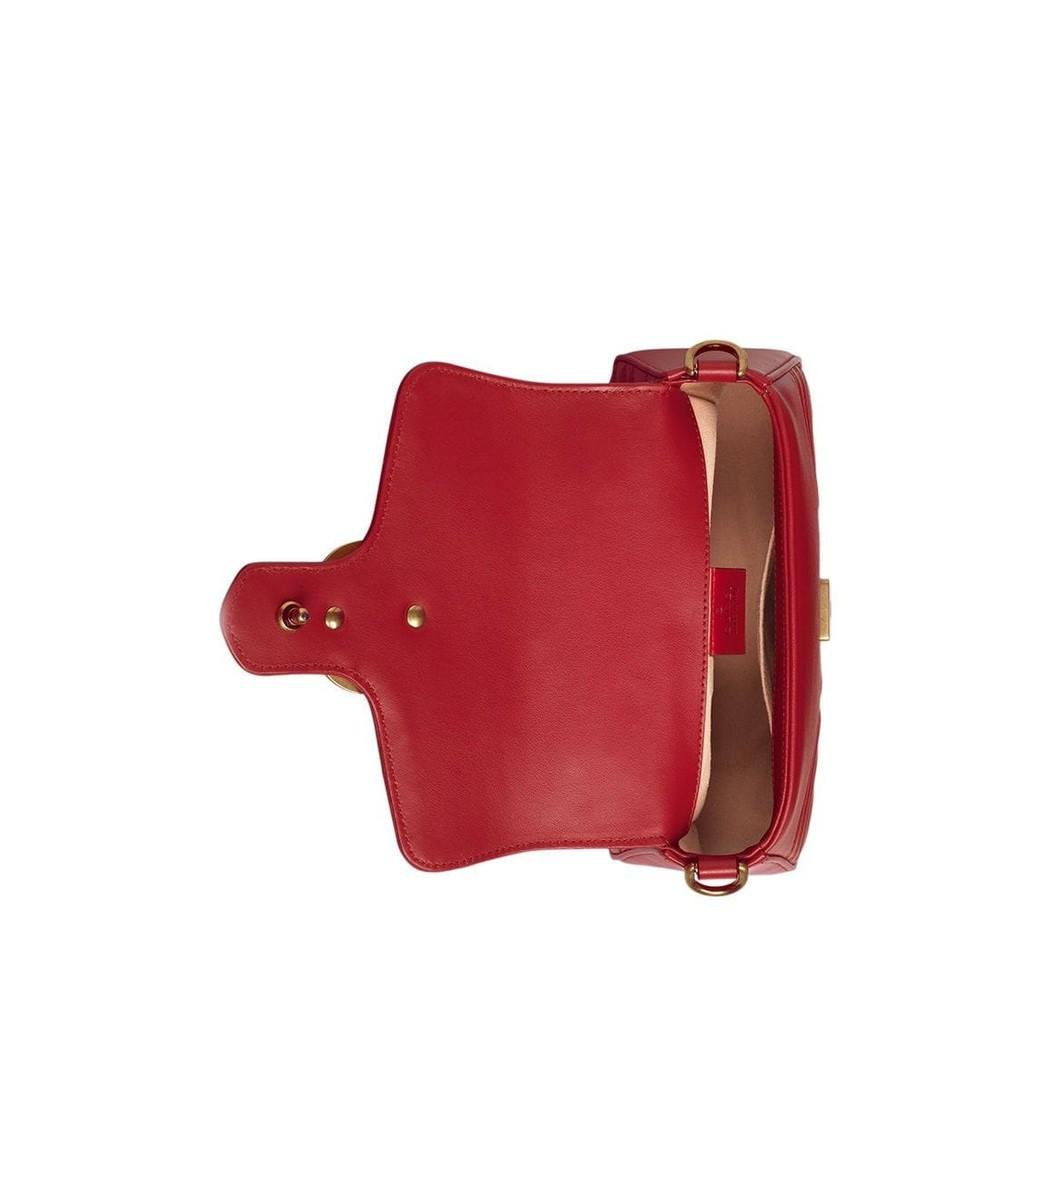 027b474aac47bf Home / Gucci / GG Marmont mini top handle bag. prev